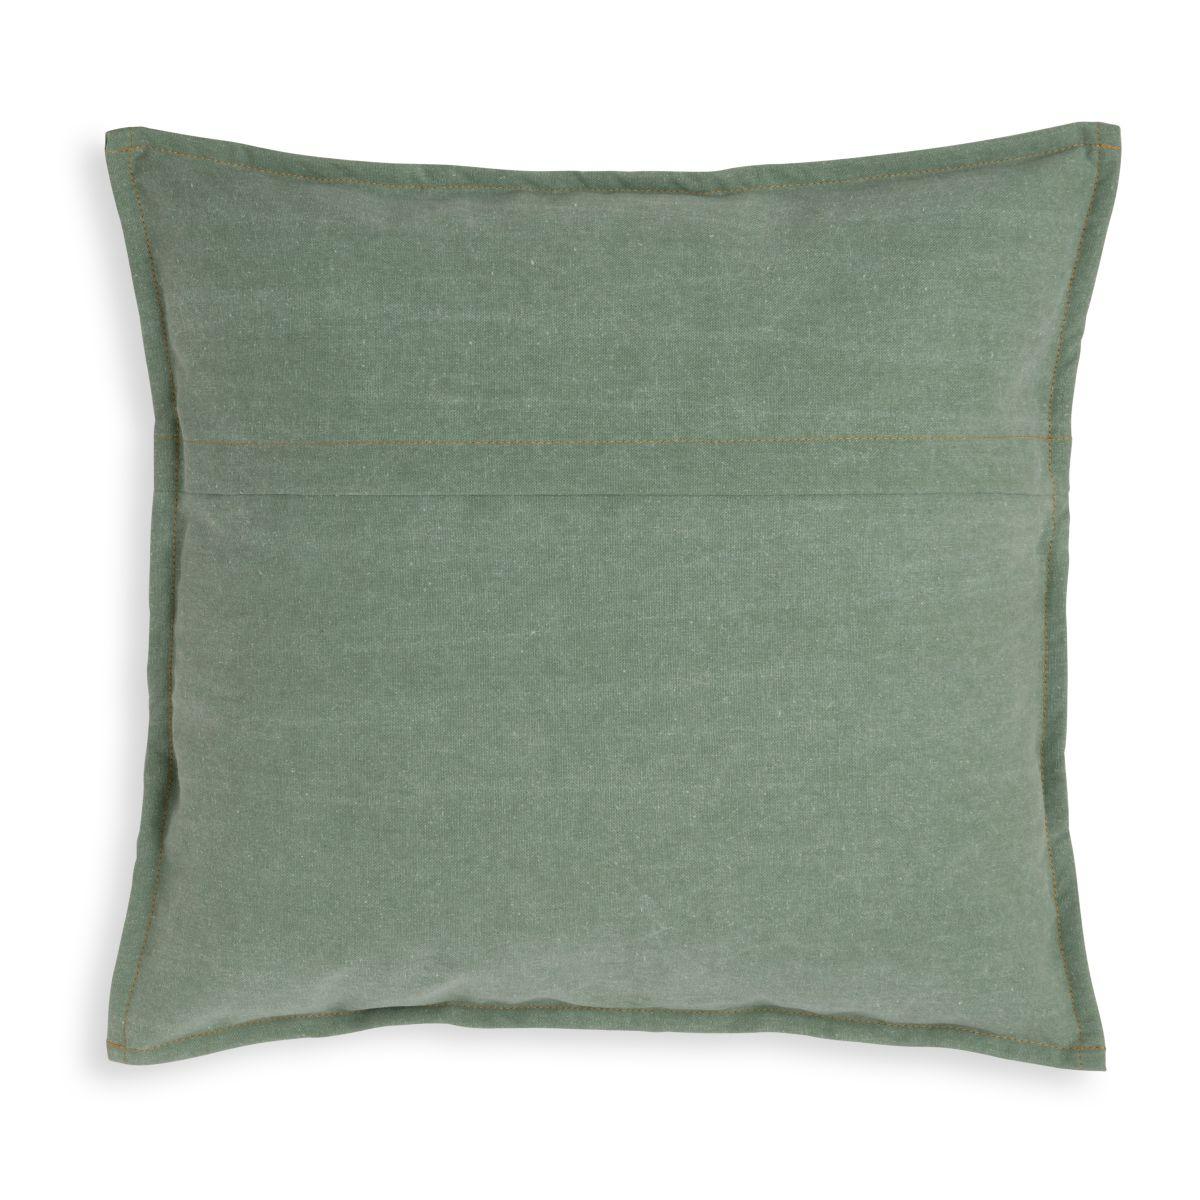 knit factory kf154012014 hope kussen groen 50x50 2